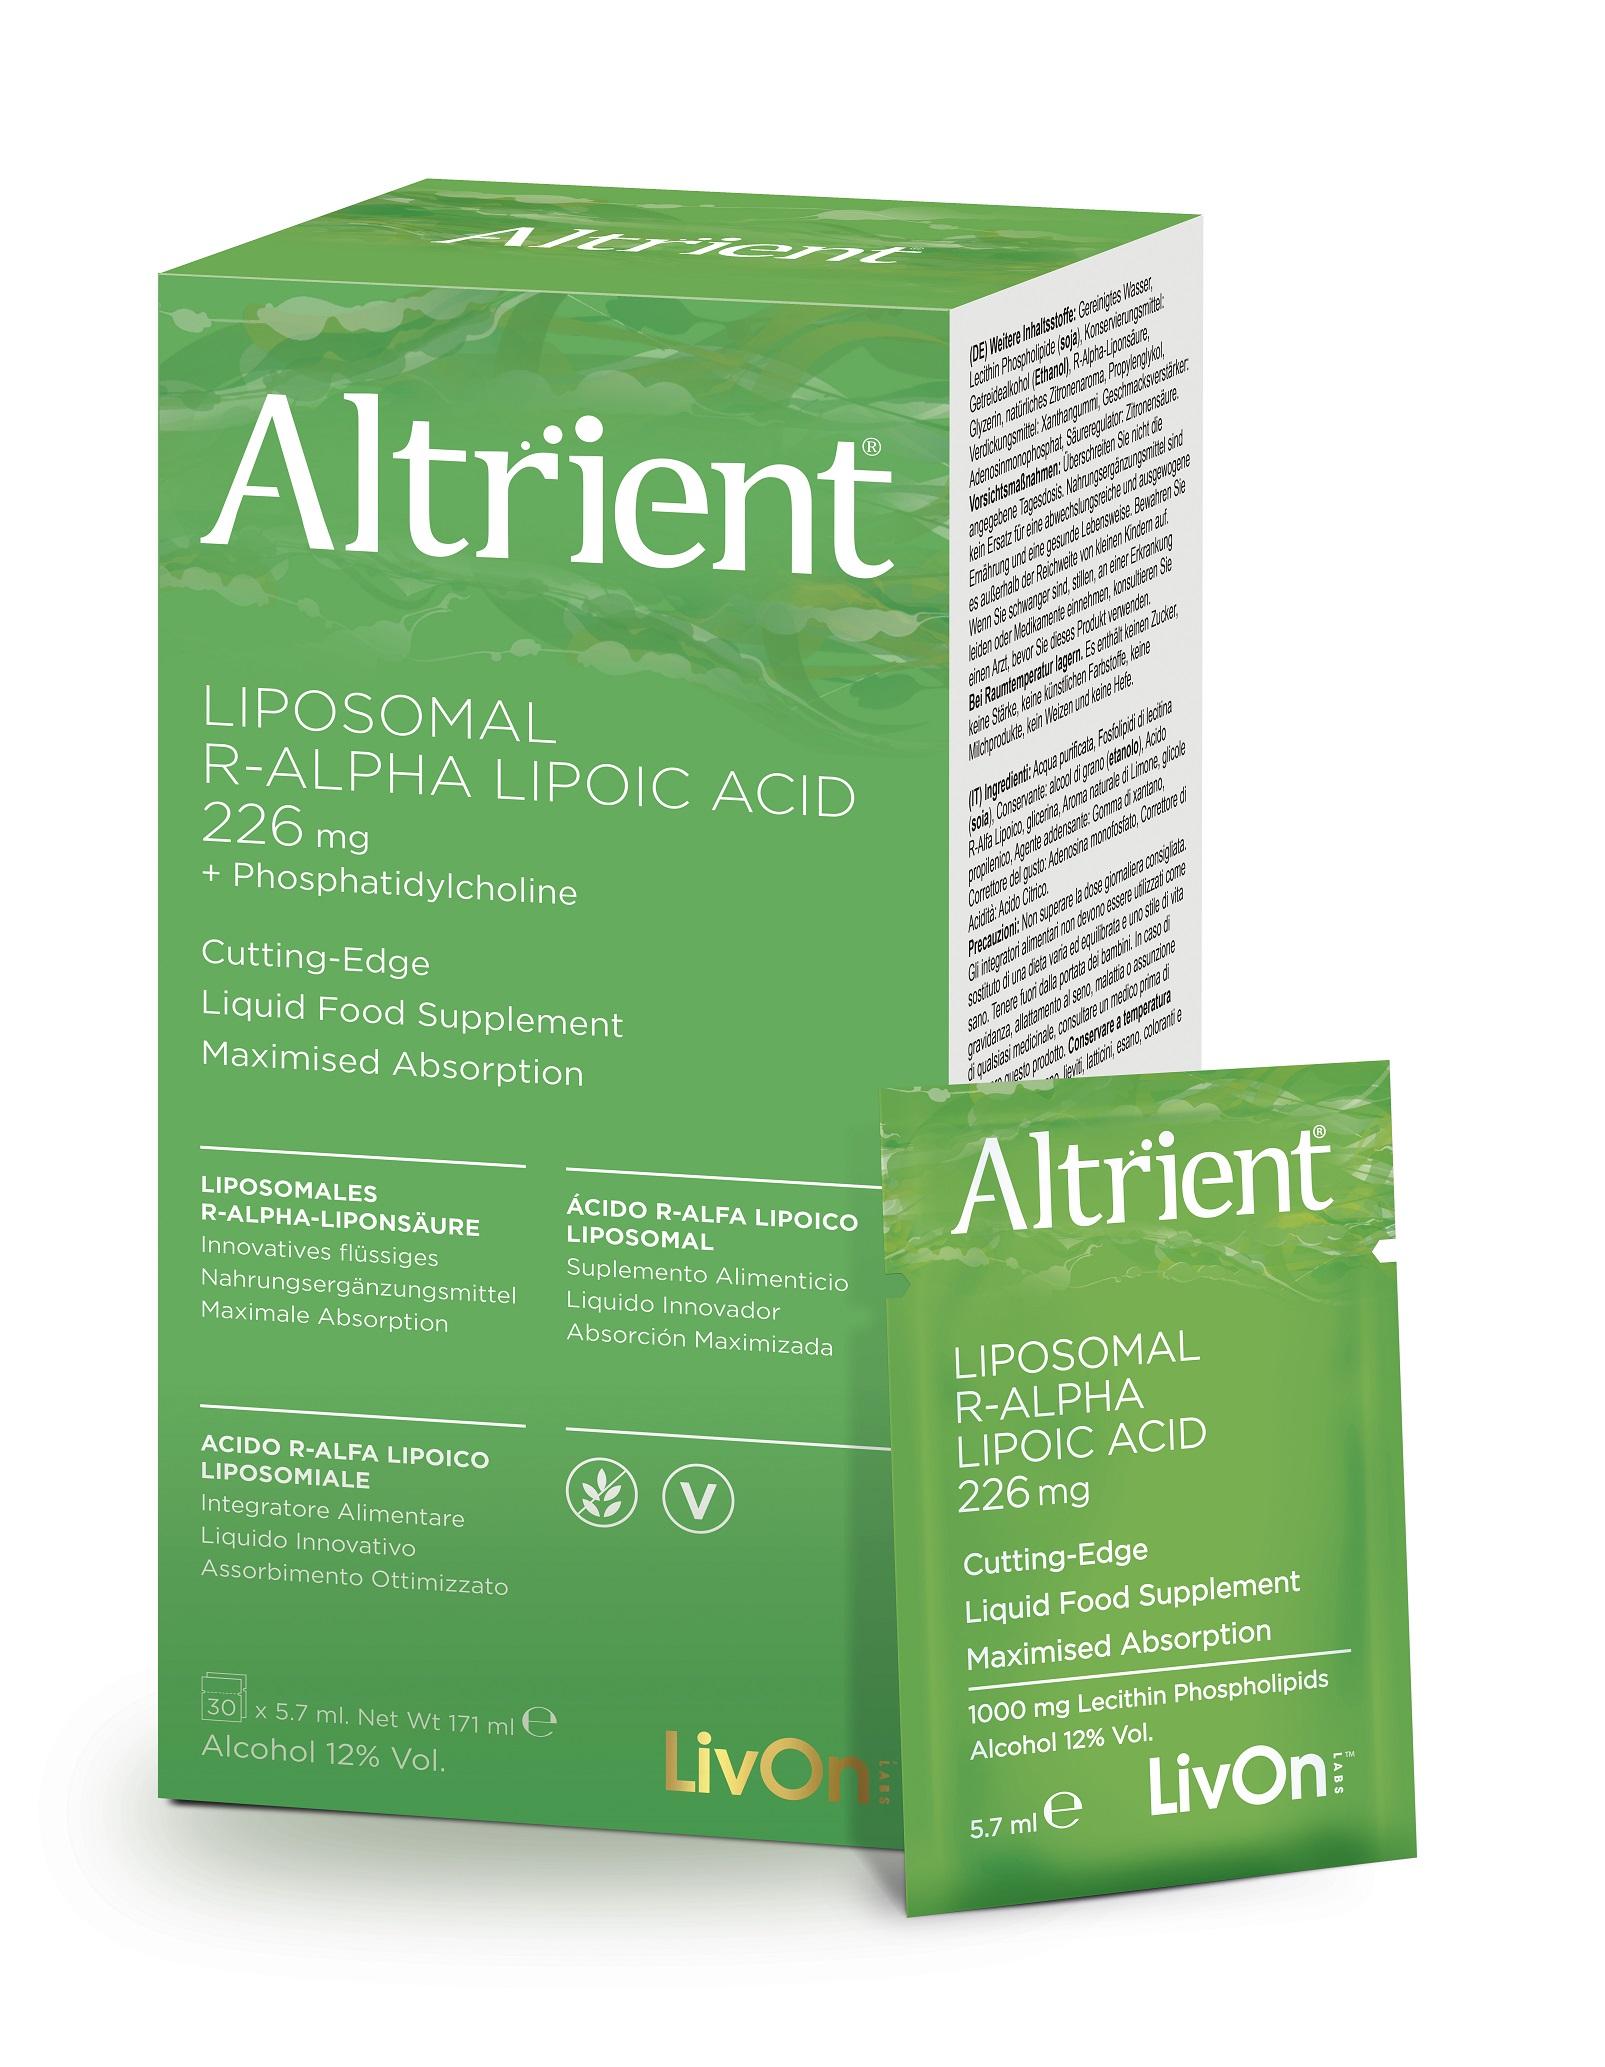 Liposomal R-Alpha Lipoic Acid 226mg 30 Sachets (Currently Unavailable)